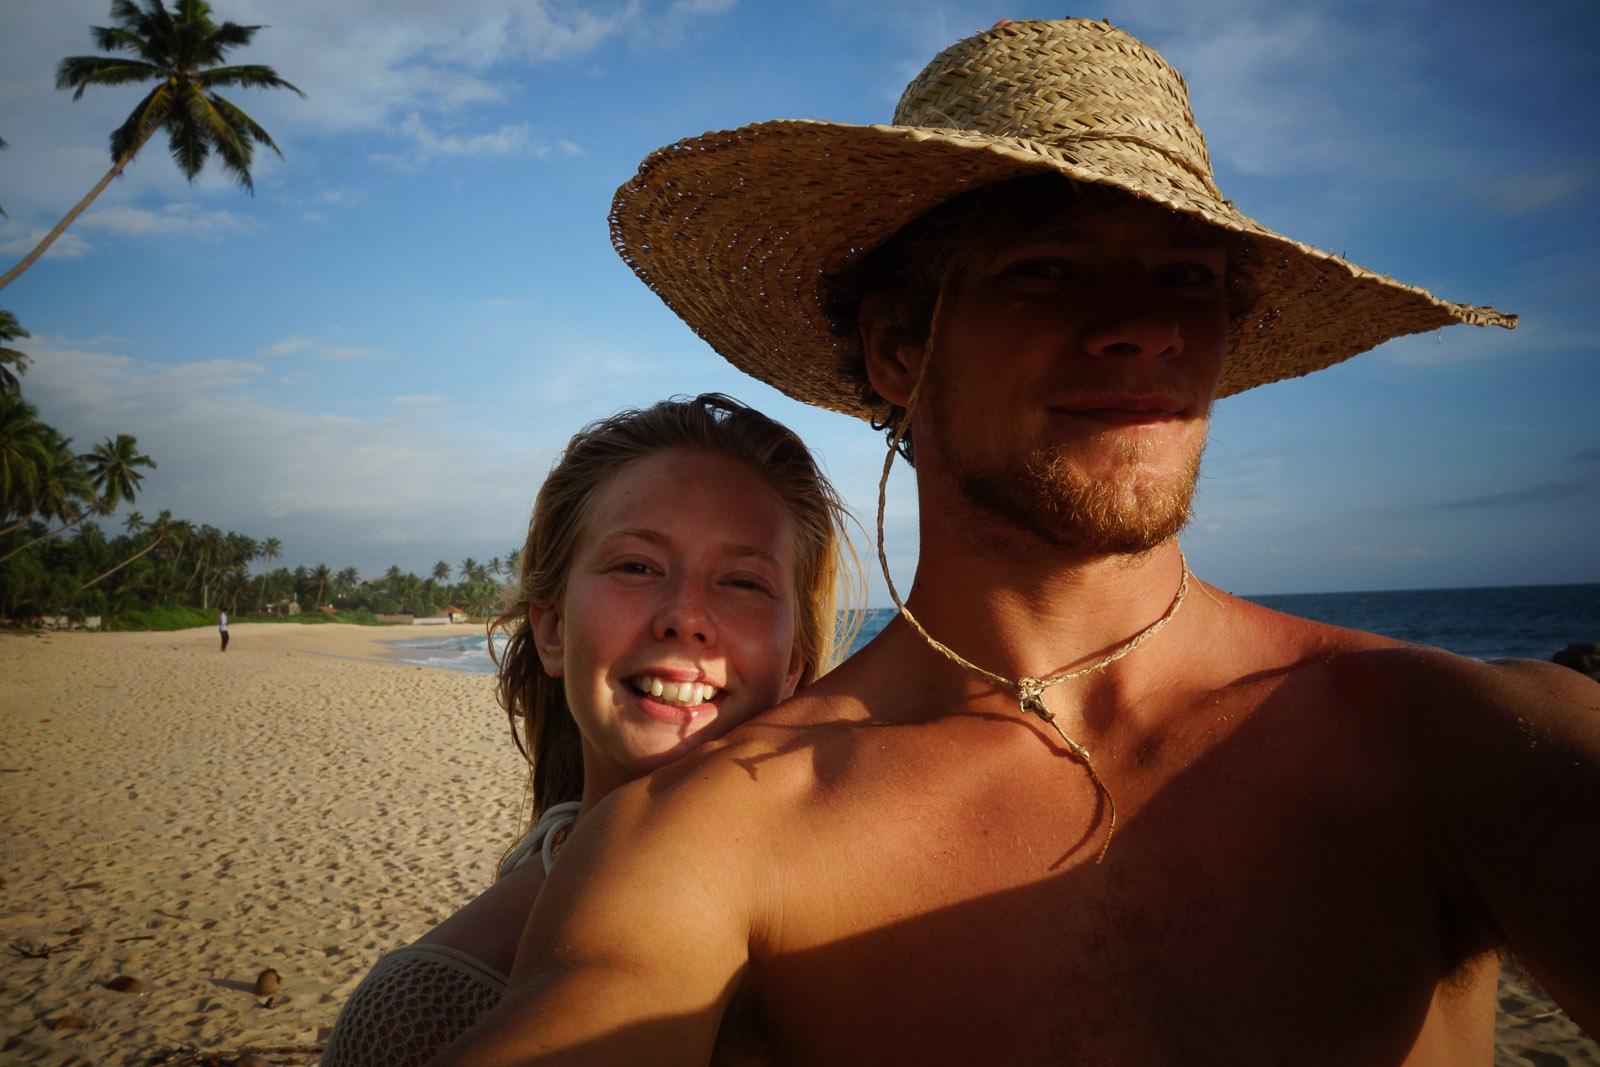 Sunshinestories-surf-travel-blog-DSC03335